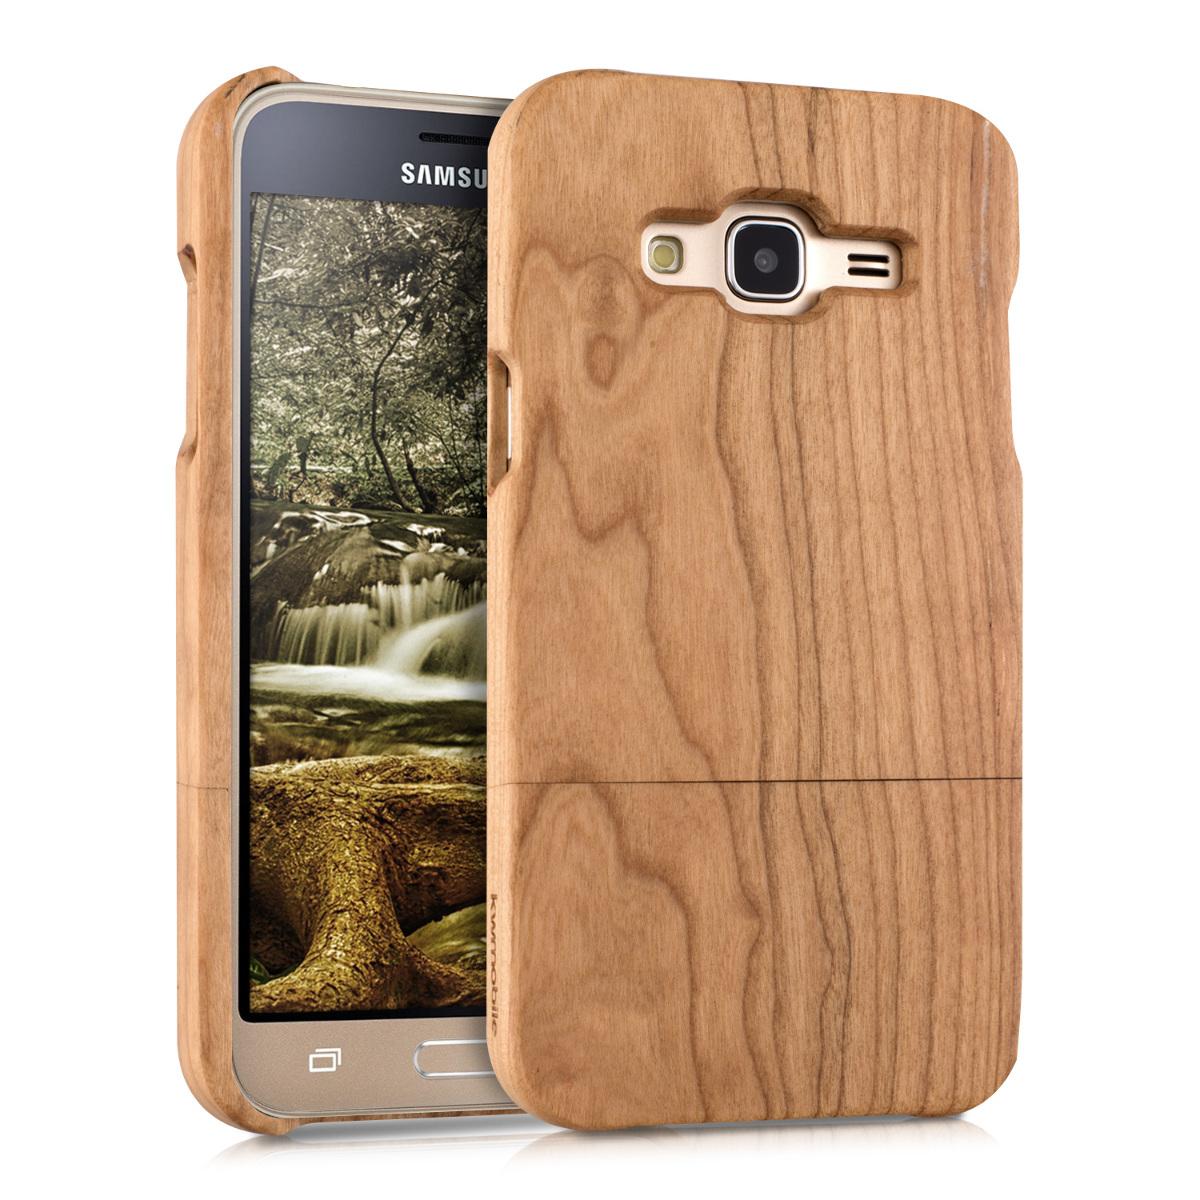 KW Ξύλινη Θήκη Samsung Galaxy J3 (2016) DUOS  - Cherrywood light brown (38160.24)